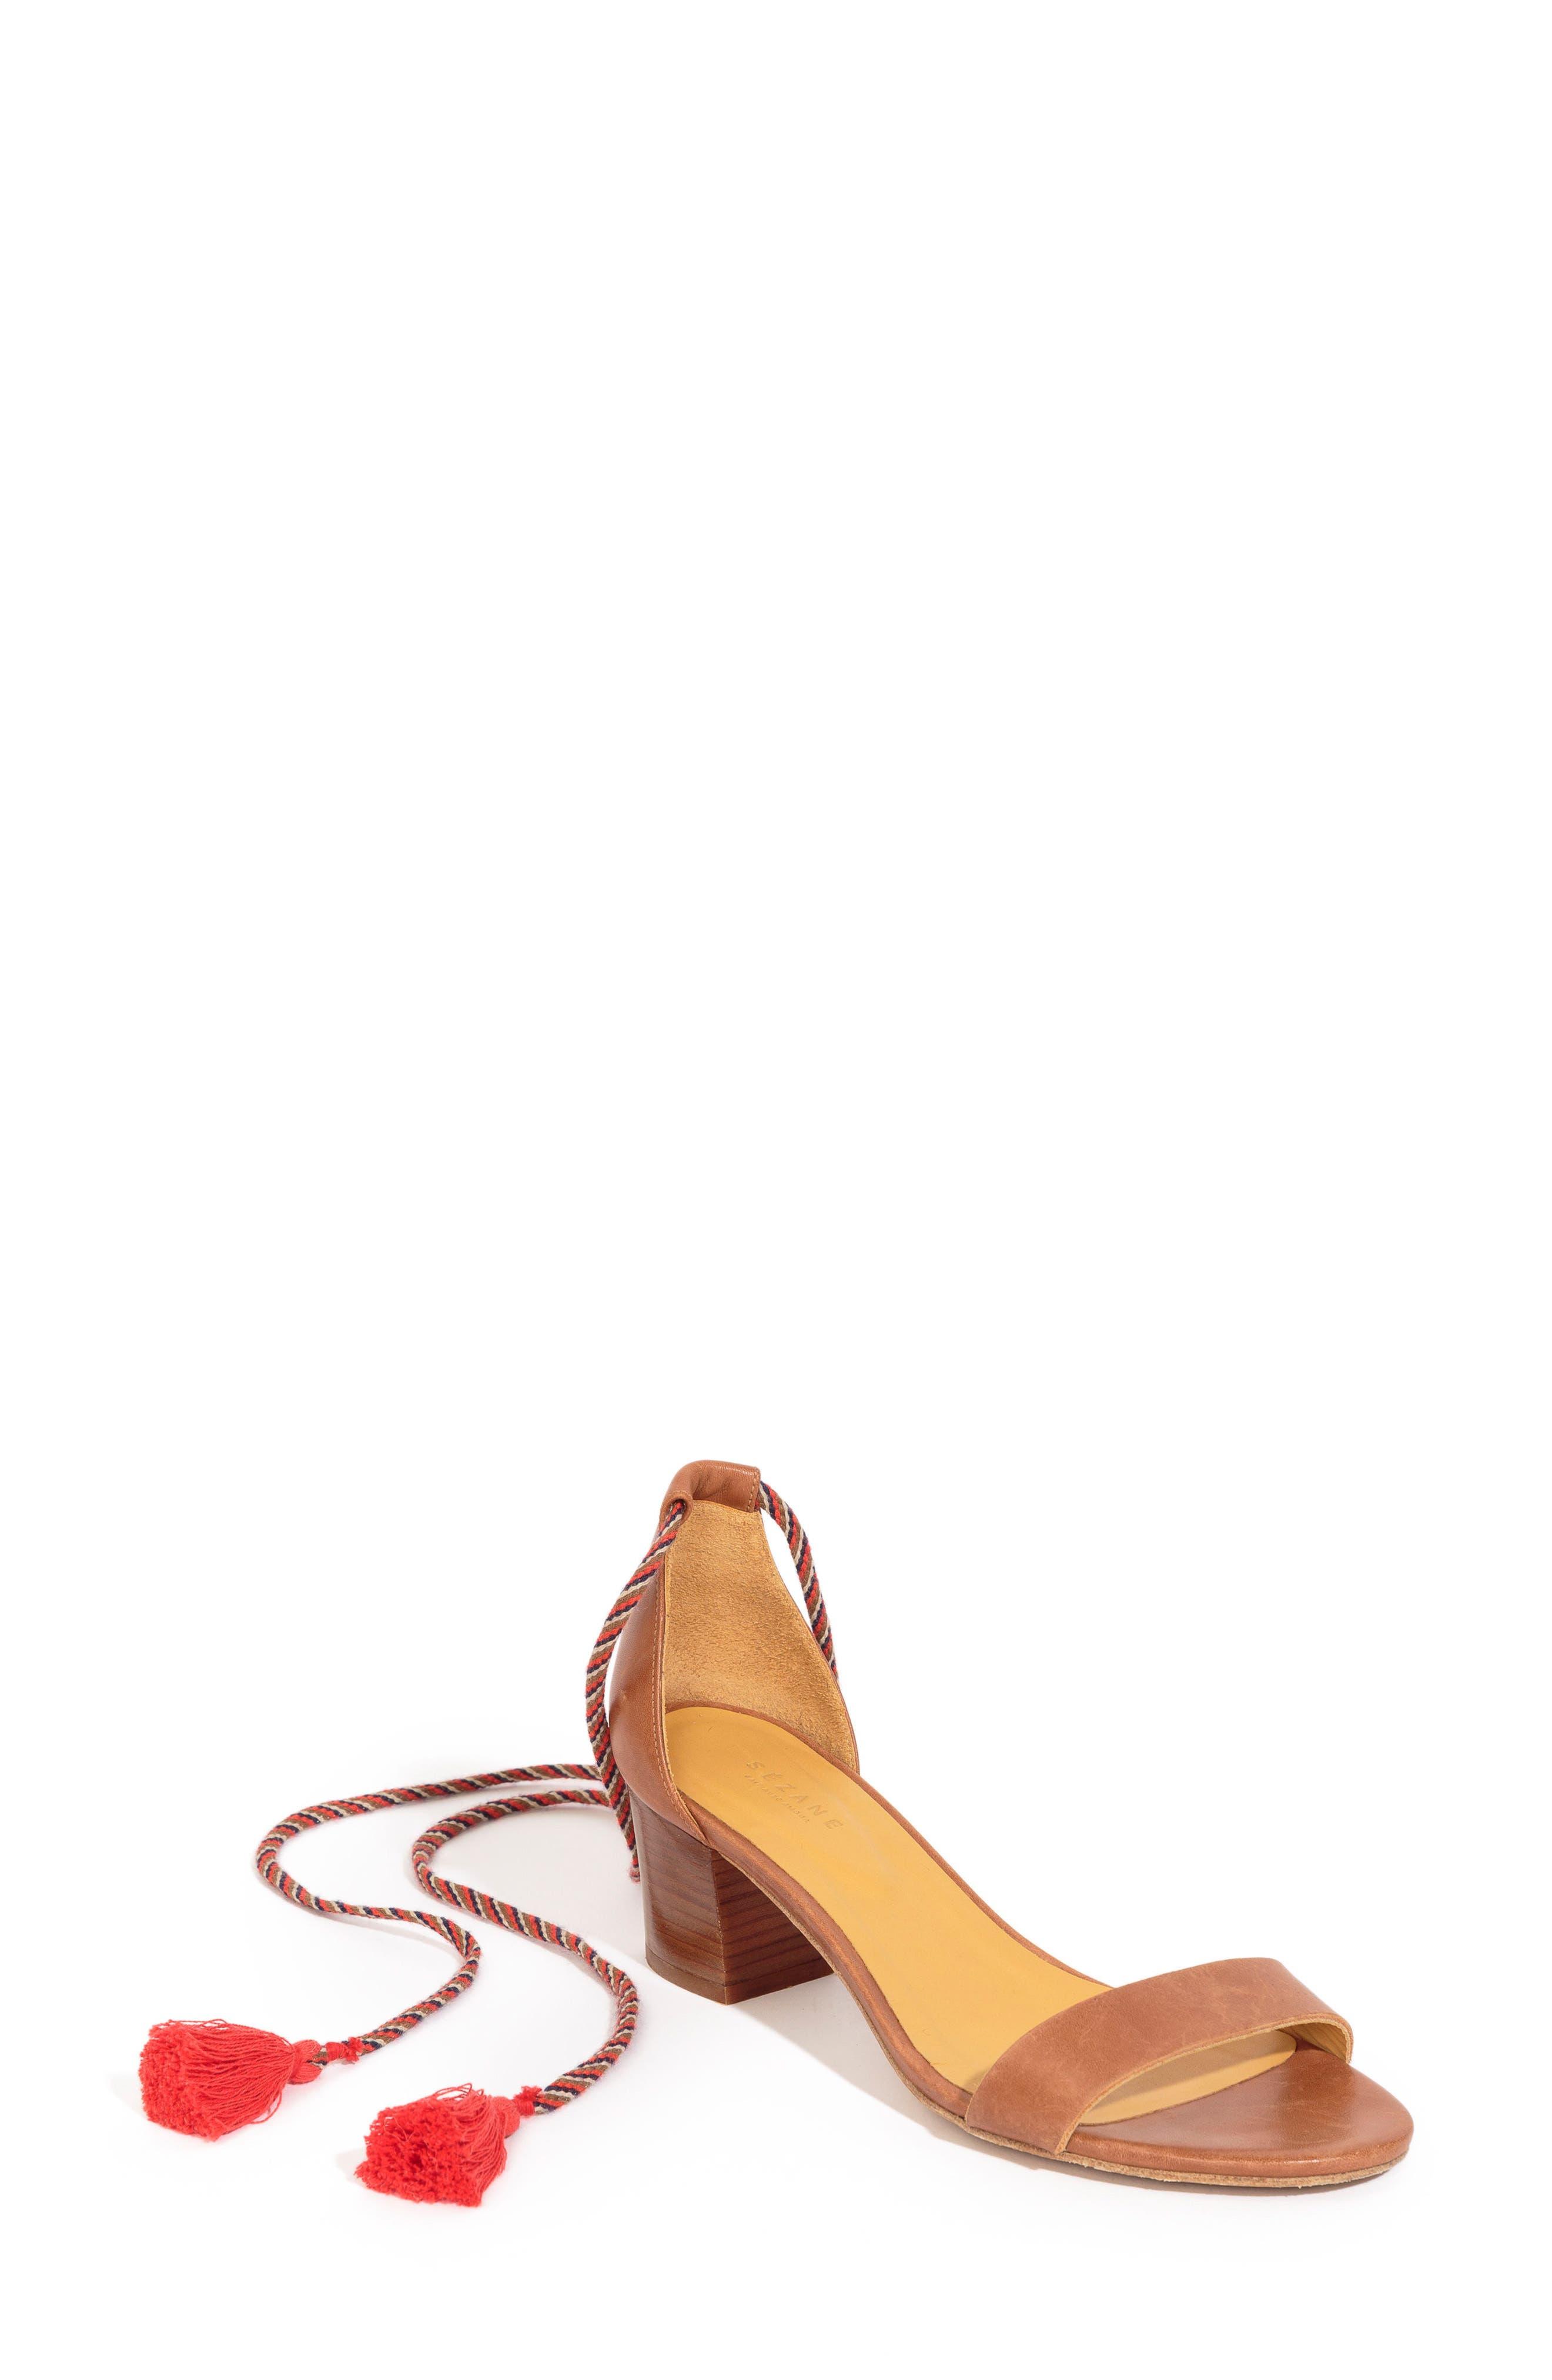 Lorenzo Ankle Wrap Block Heel Sandal,                         Main,                         color, CAMEL LEATHER